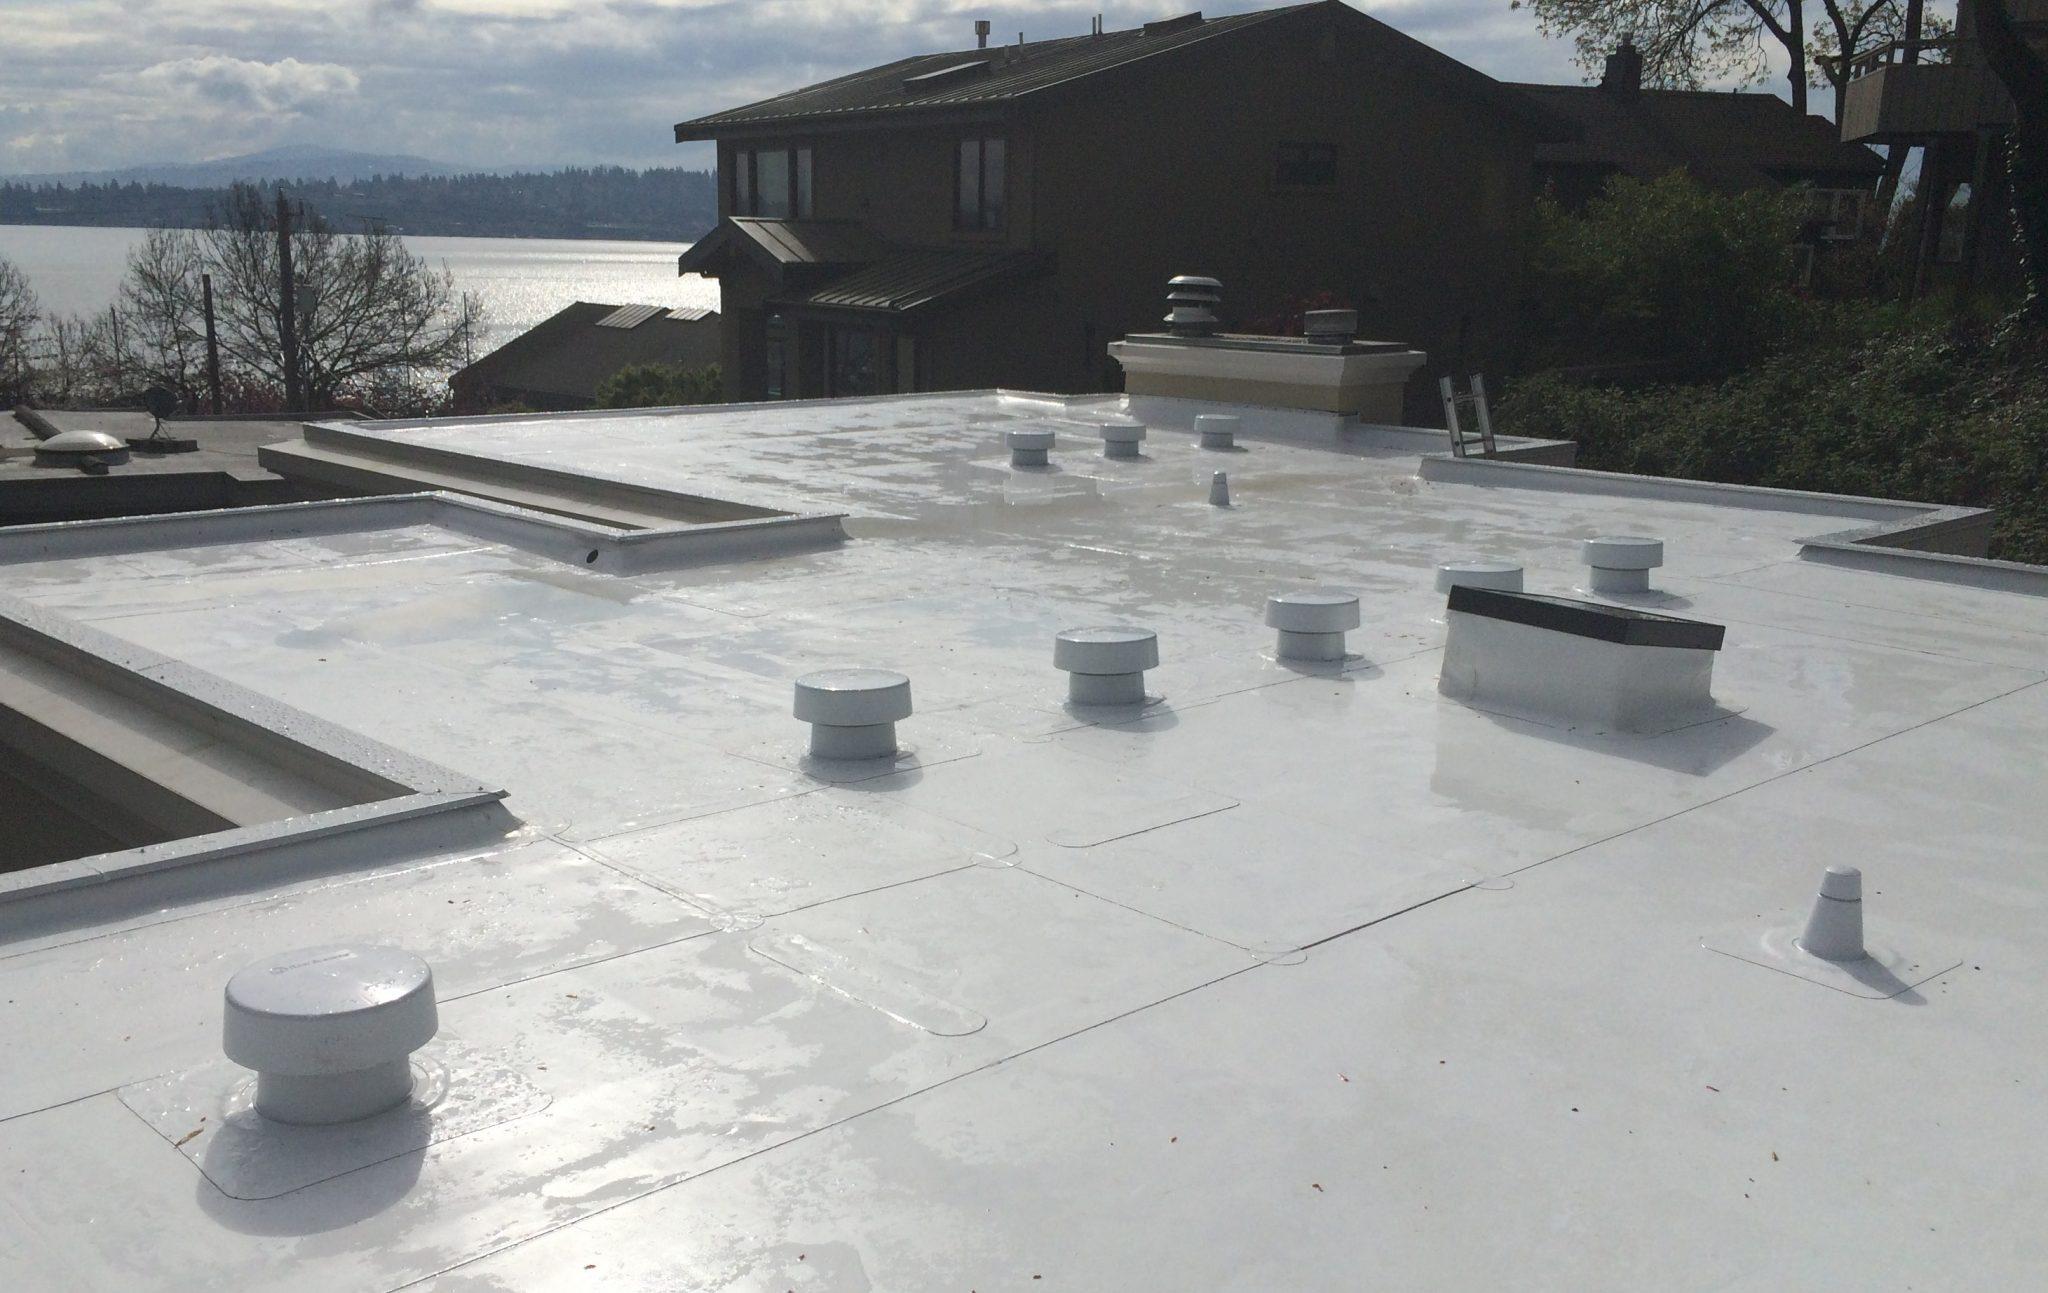 Seattle Pvc Flat Roof Pinnacle Roofing Professioanls Llc